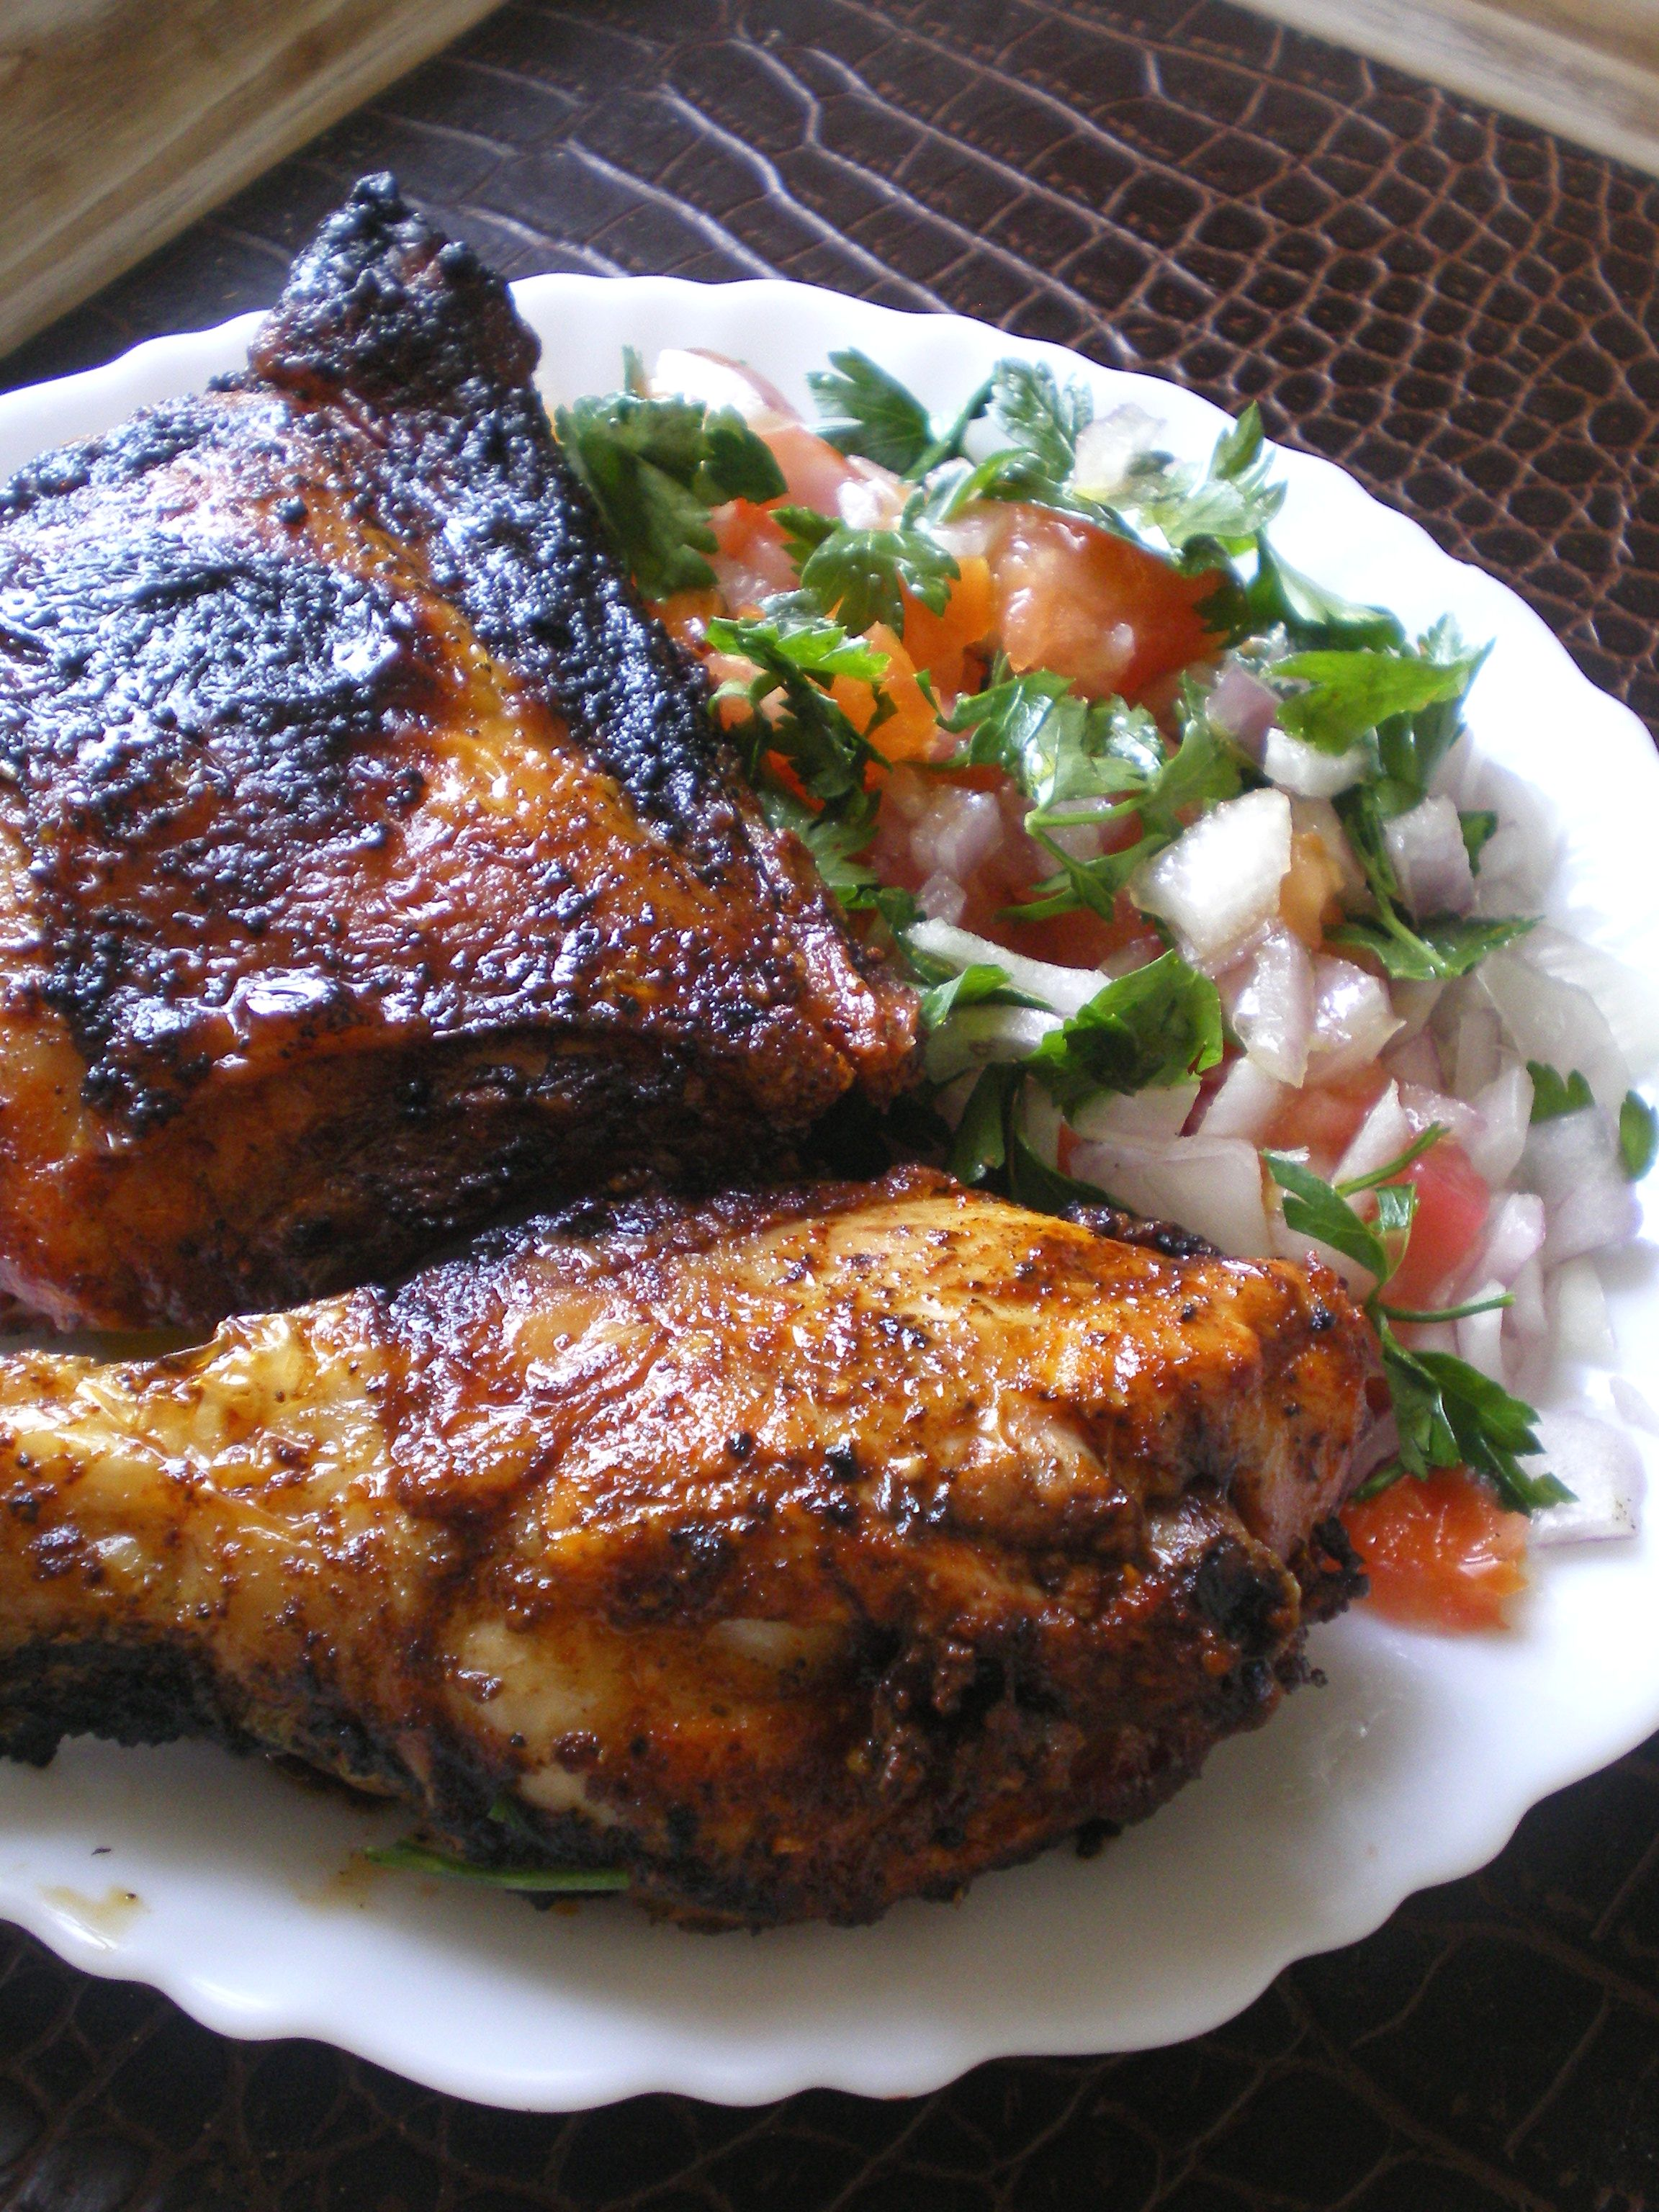 poulet tandoori grill bienvenuedansmacuisine. Black Bedroom Furniture Sets. Home Design Ideas